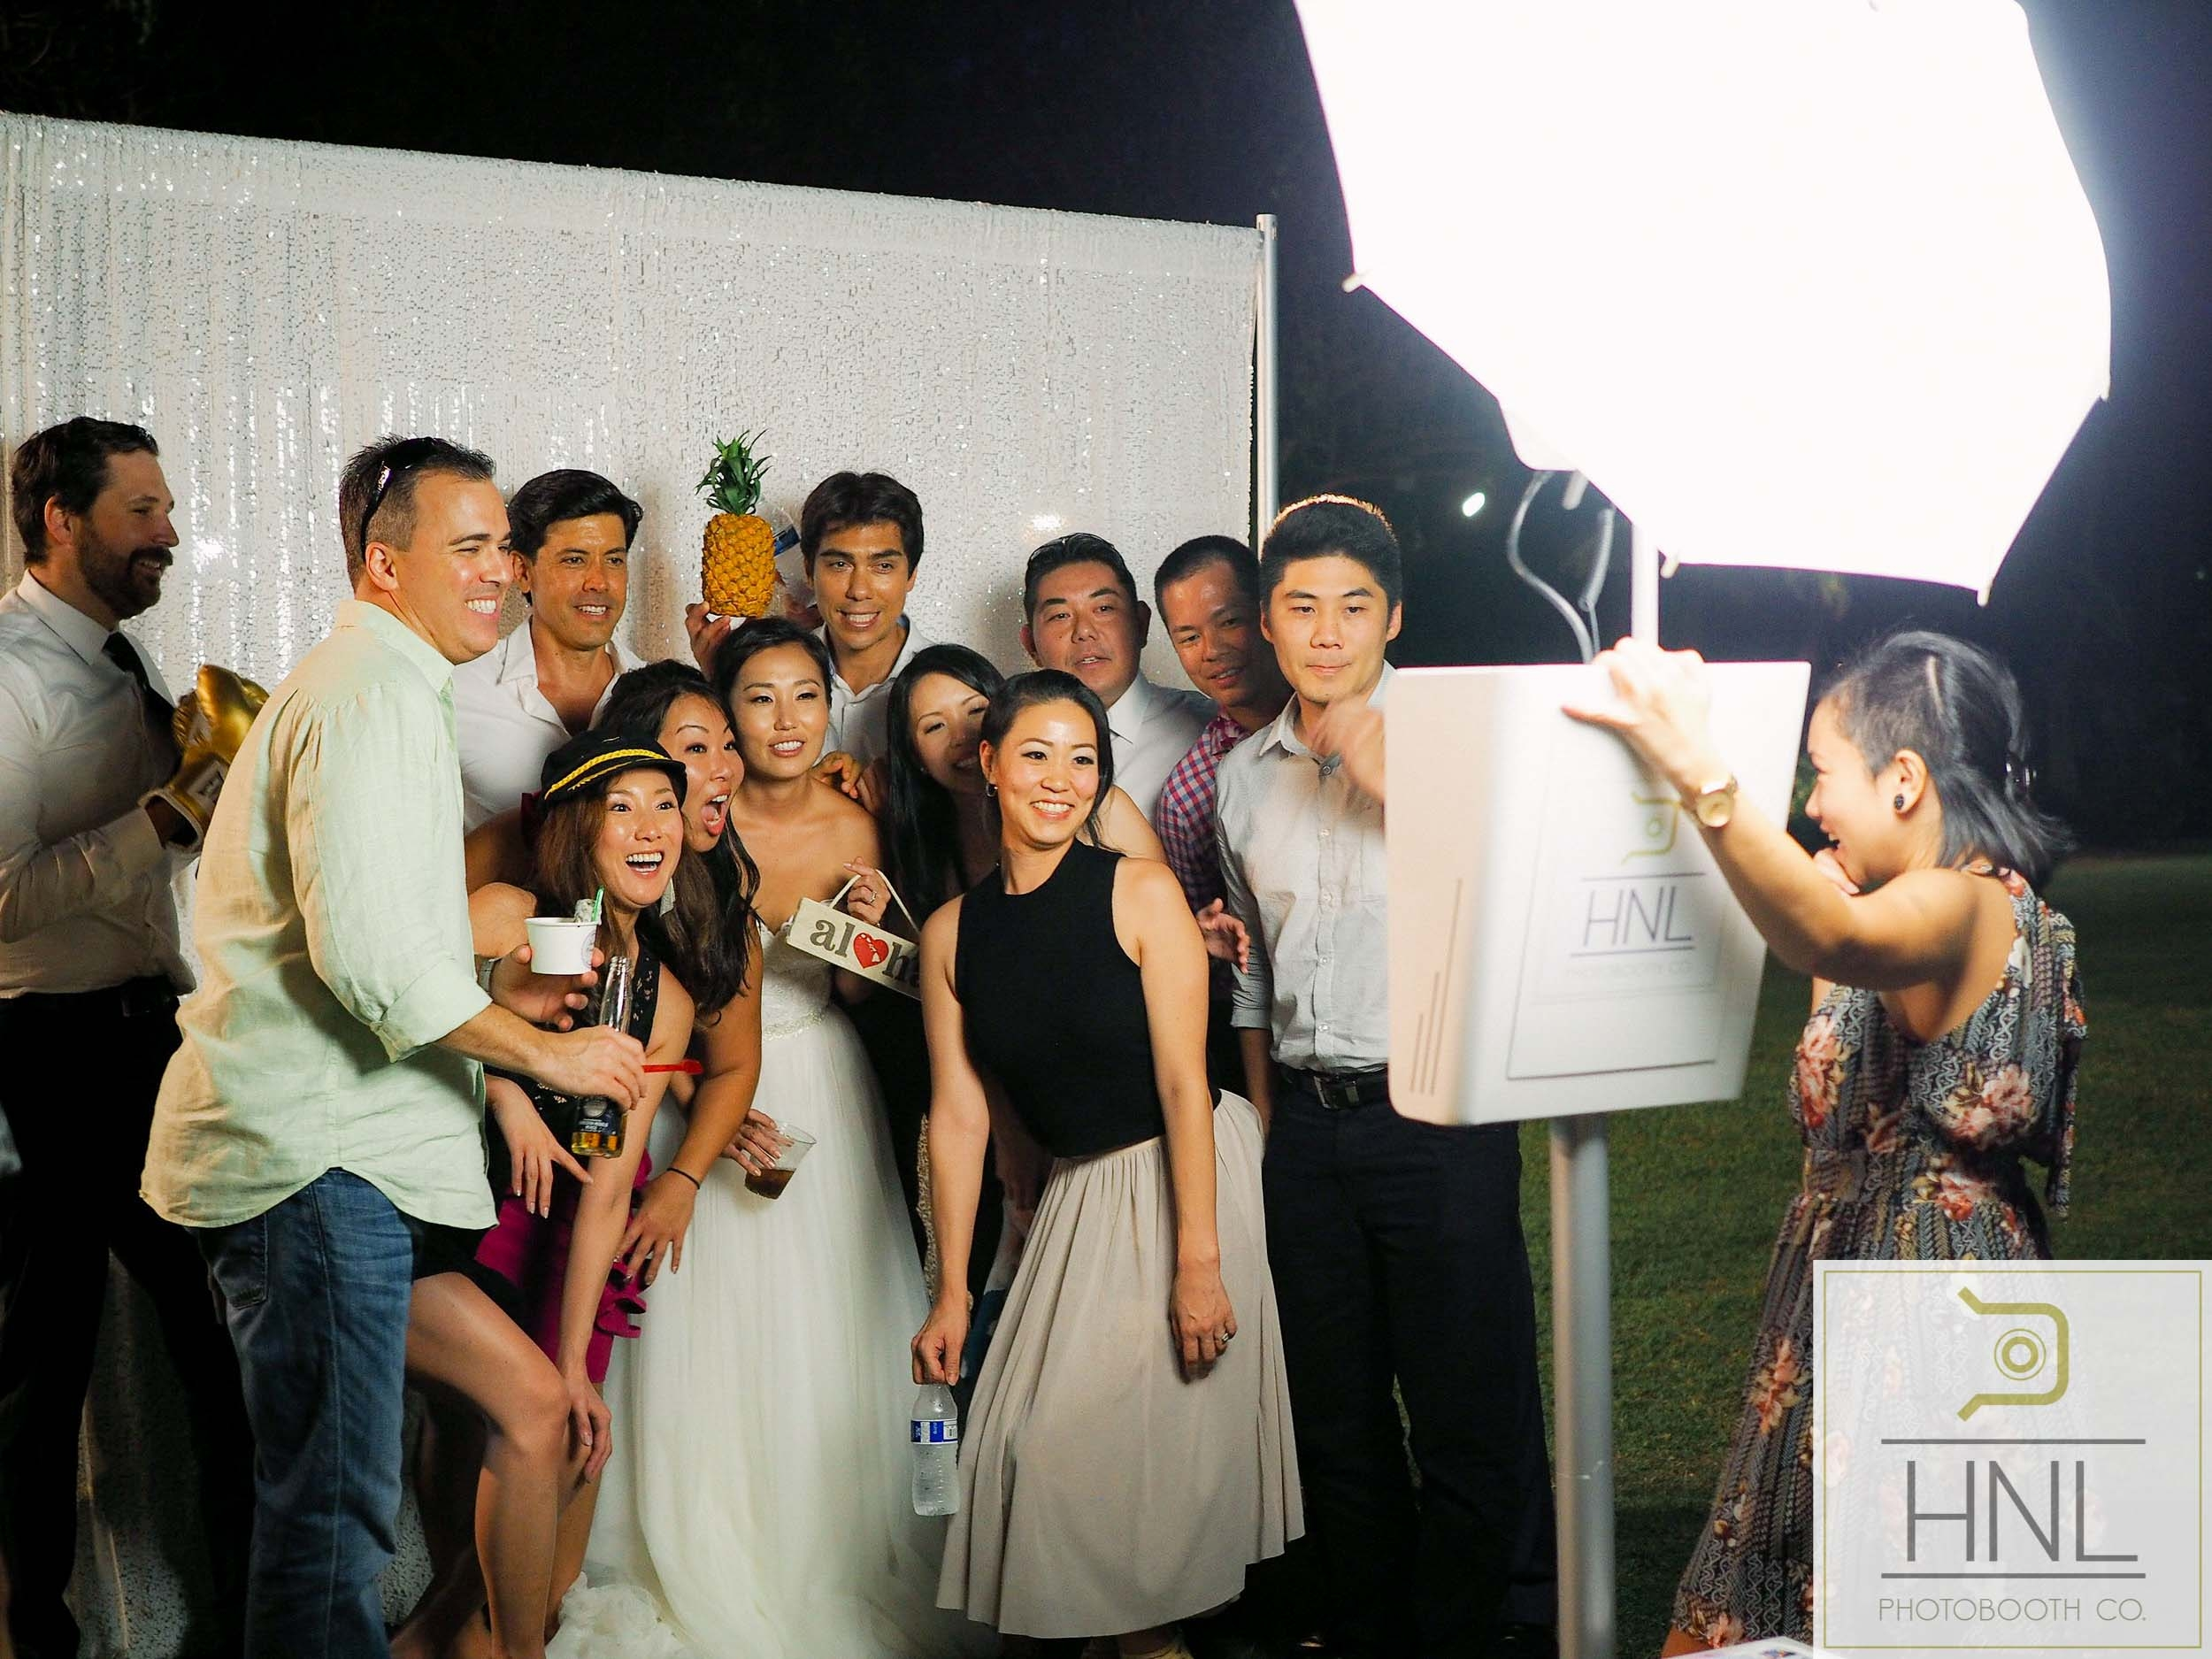 HNL Photobooth Co.